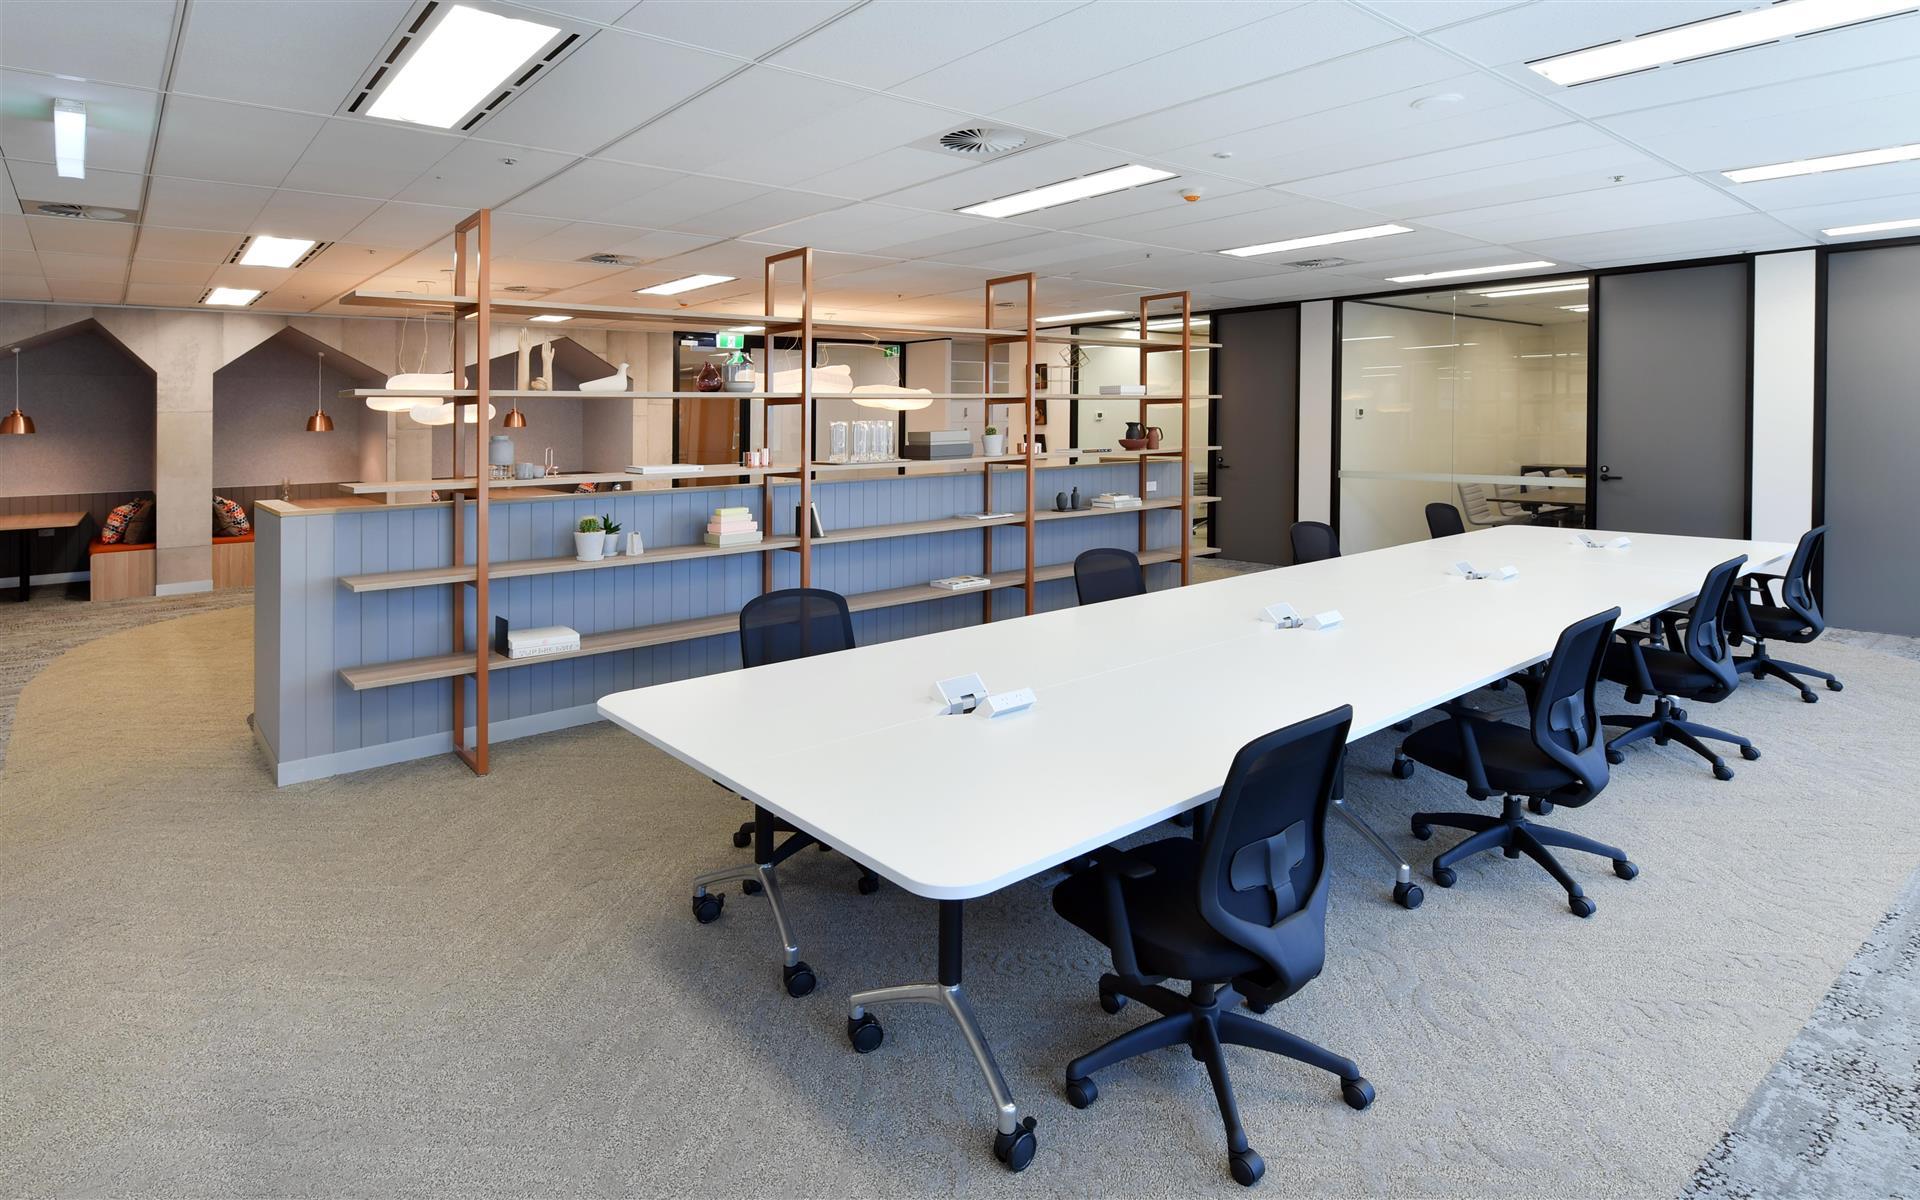 Flexispace @ 1 Martin Place - Dedicated Desk @ 1 Martin Place